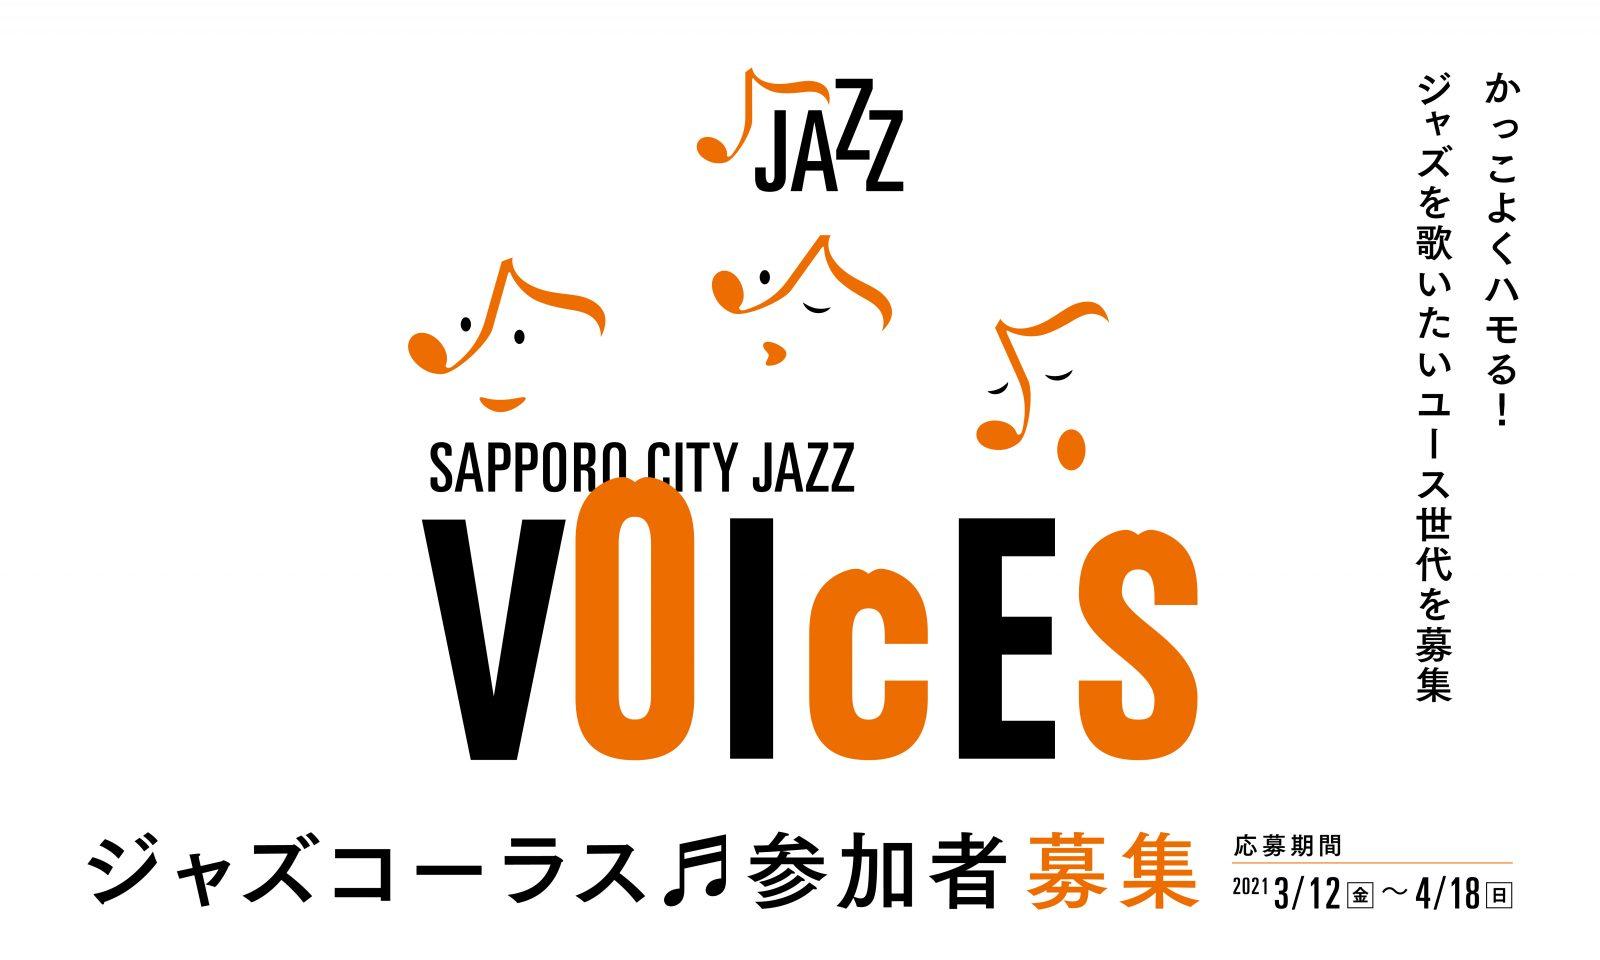 SAPPORO CITY JAZZ VOICES